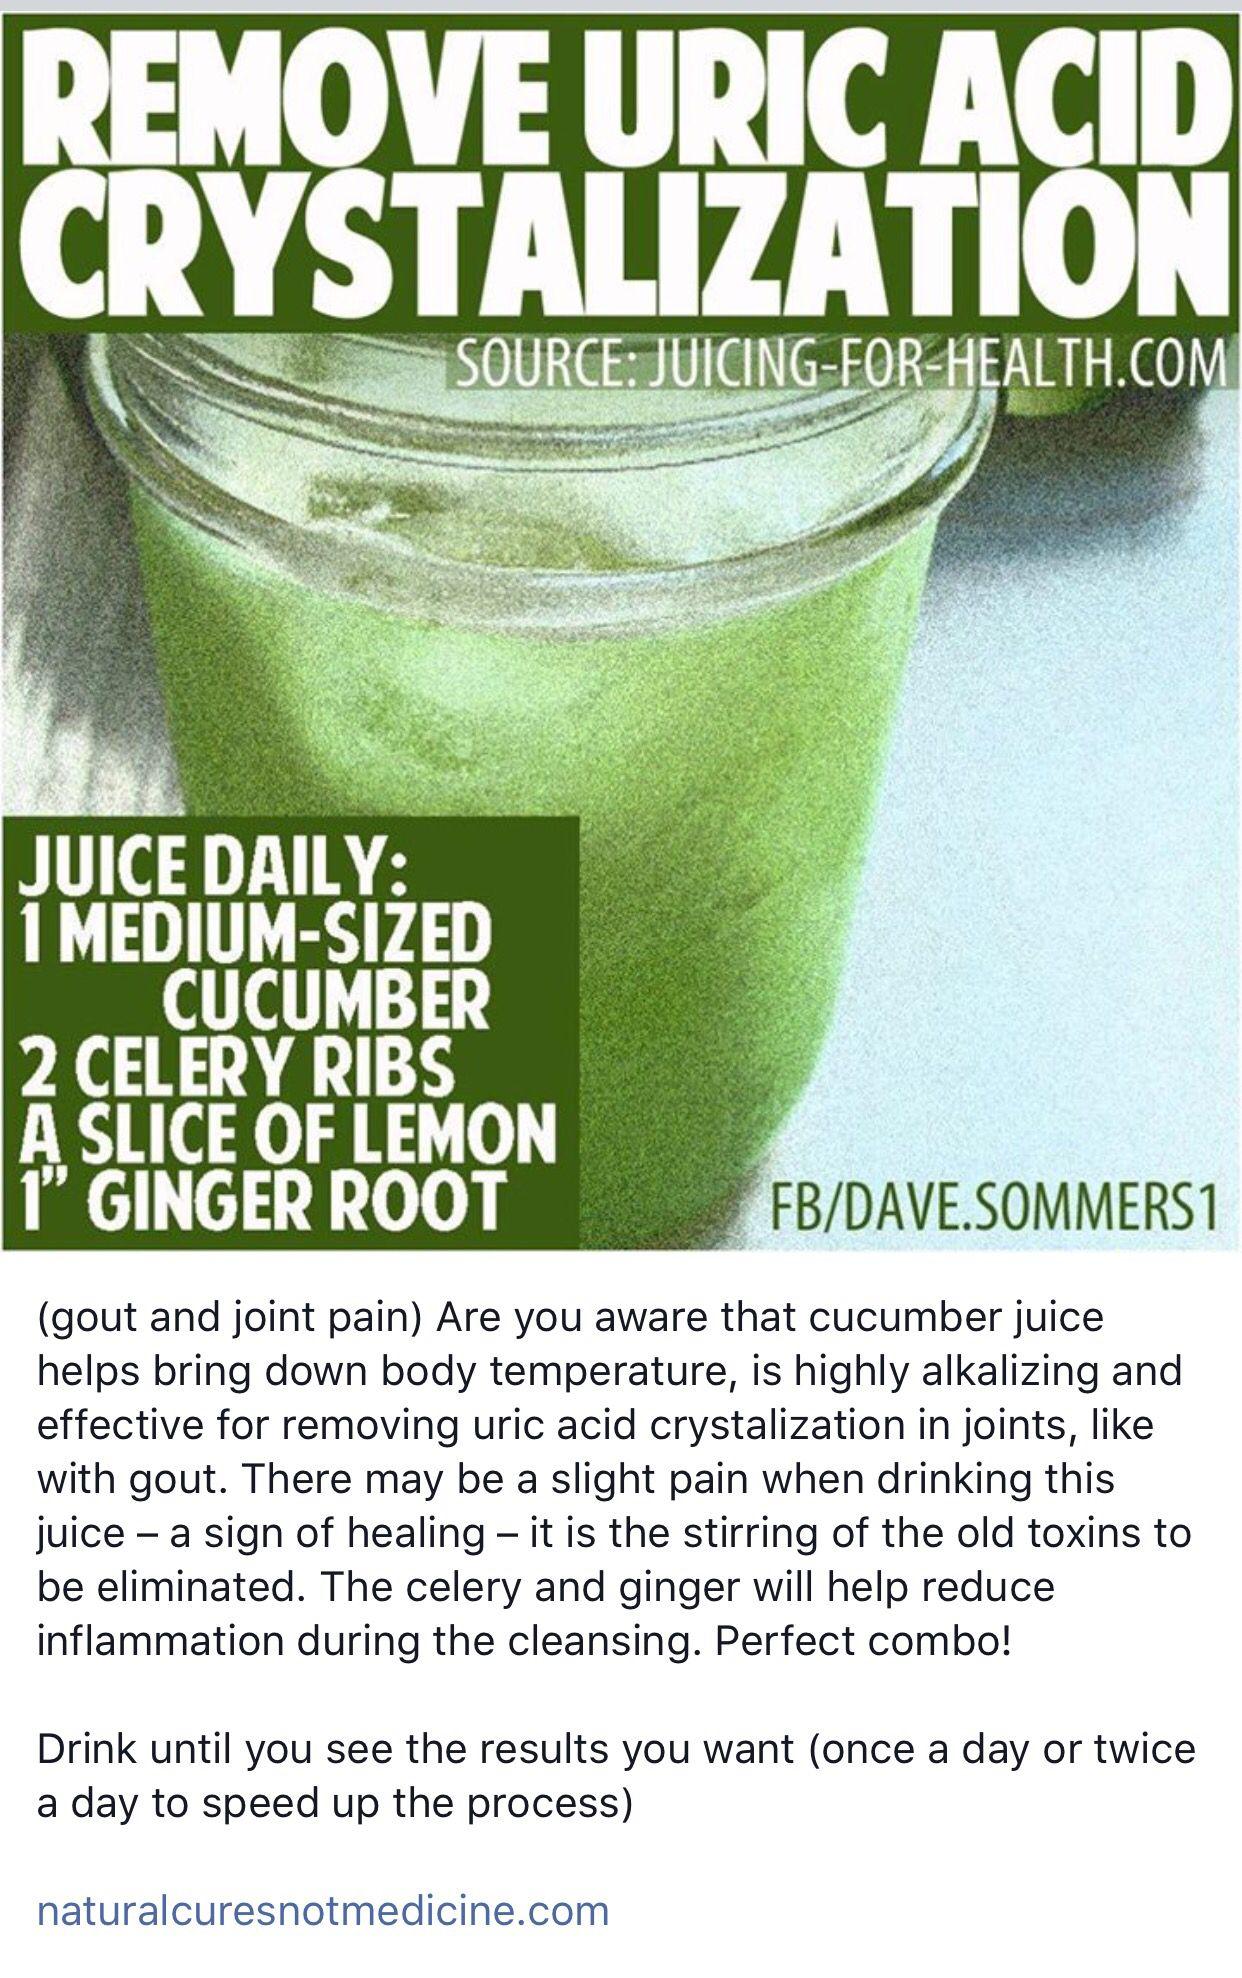 Juice to remove uric acid